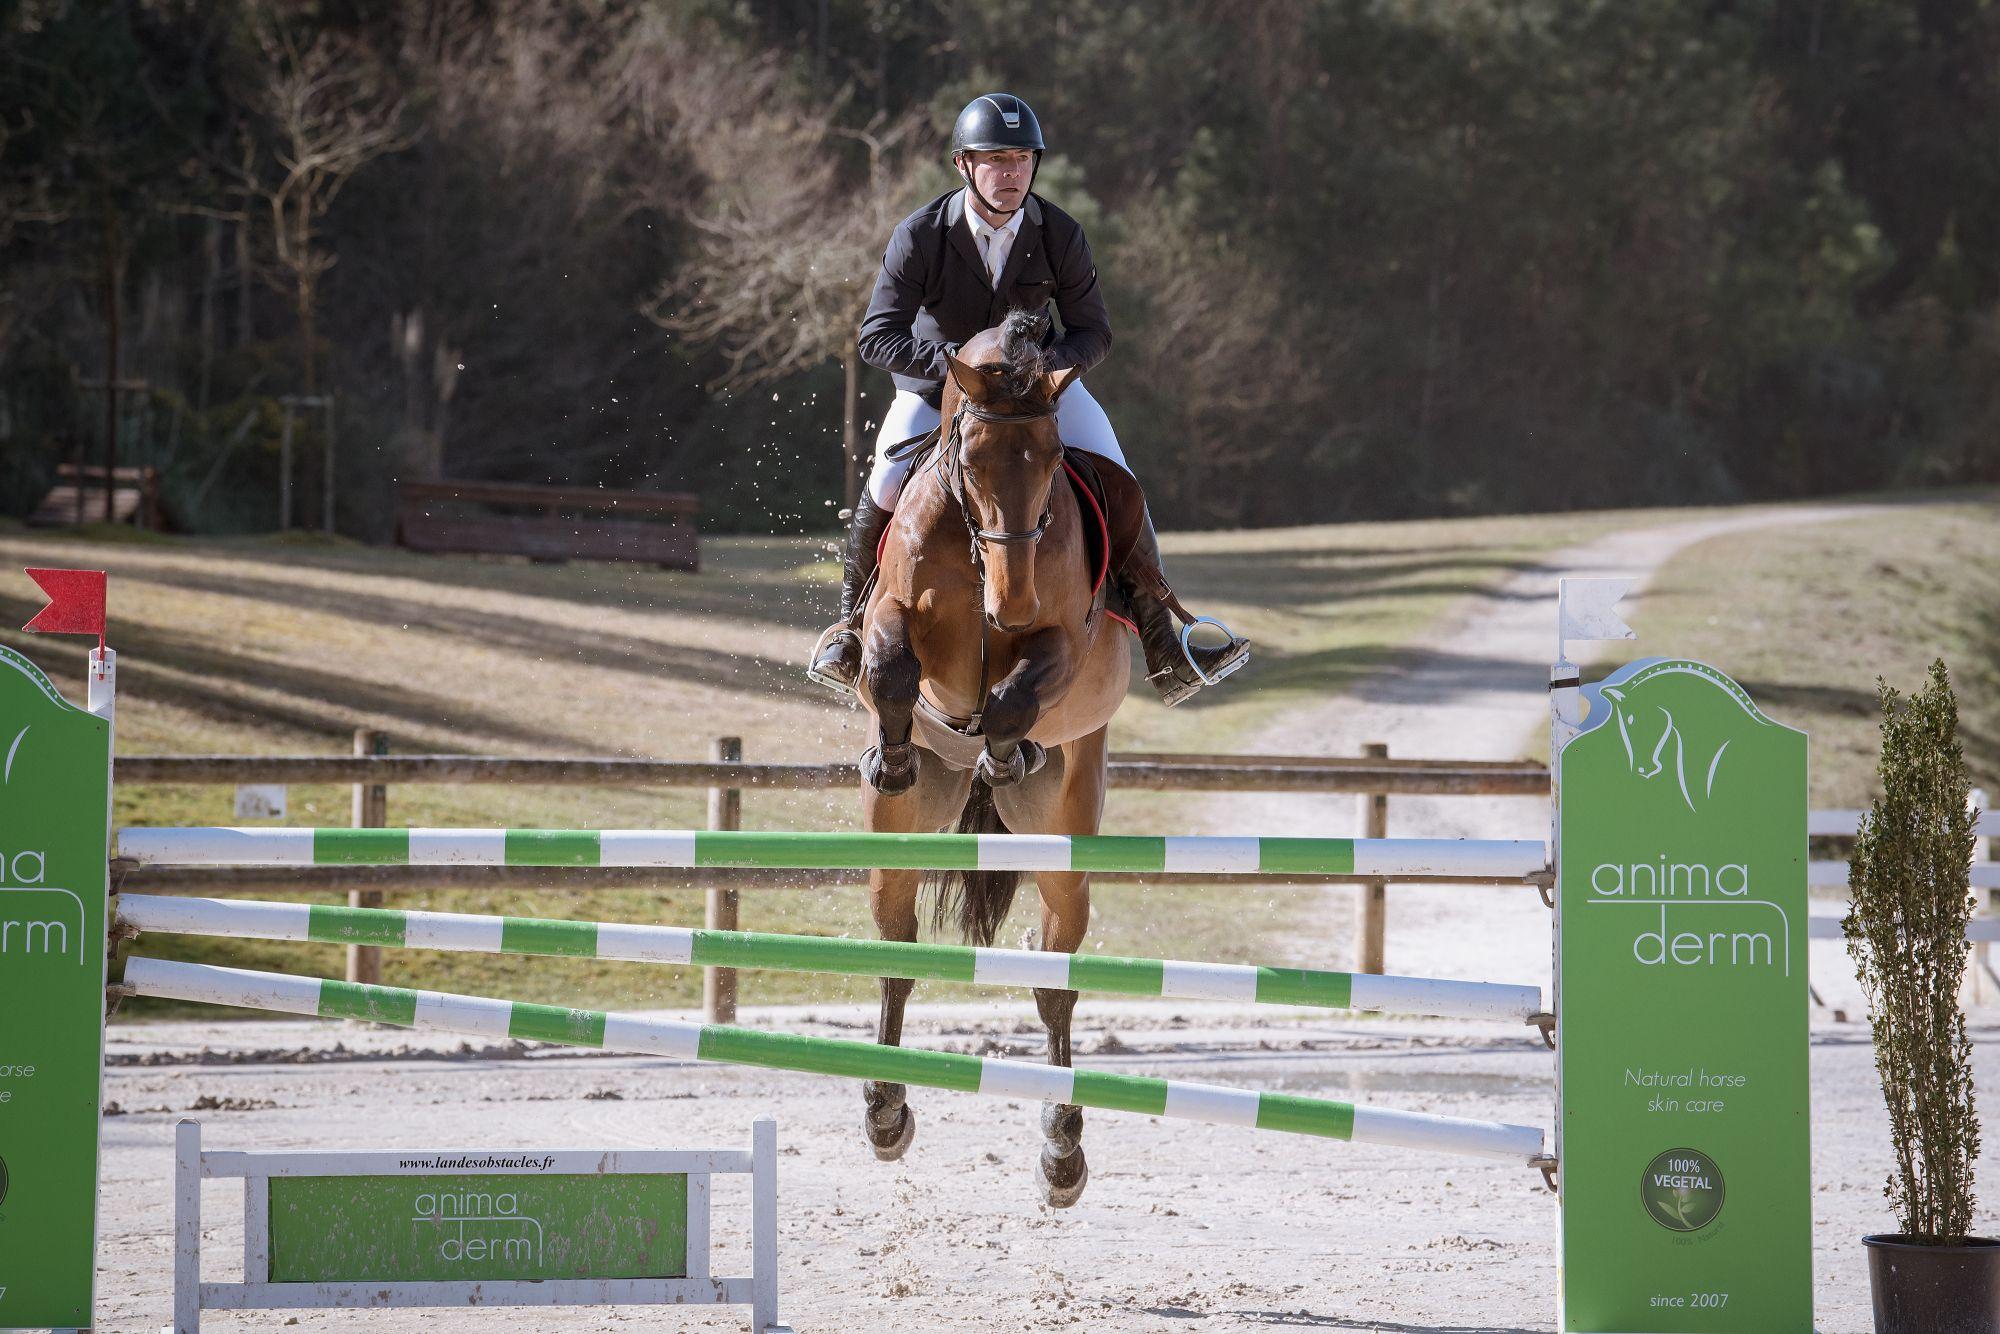 diamanti-van-de-helle-z-las-jump-biarritz-show-jumping-horses-feb-23-rd-2019-2